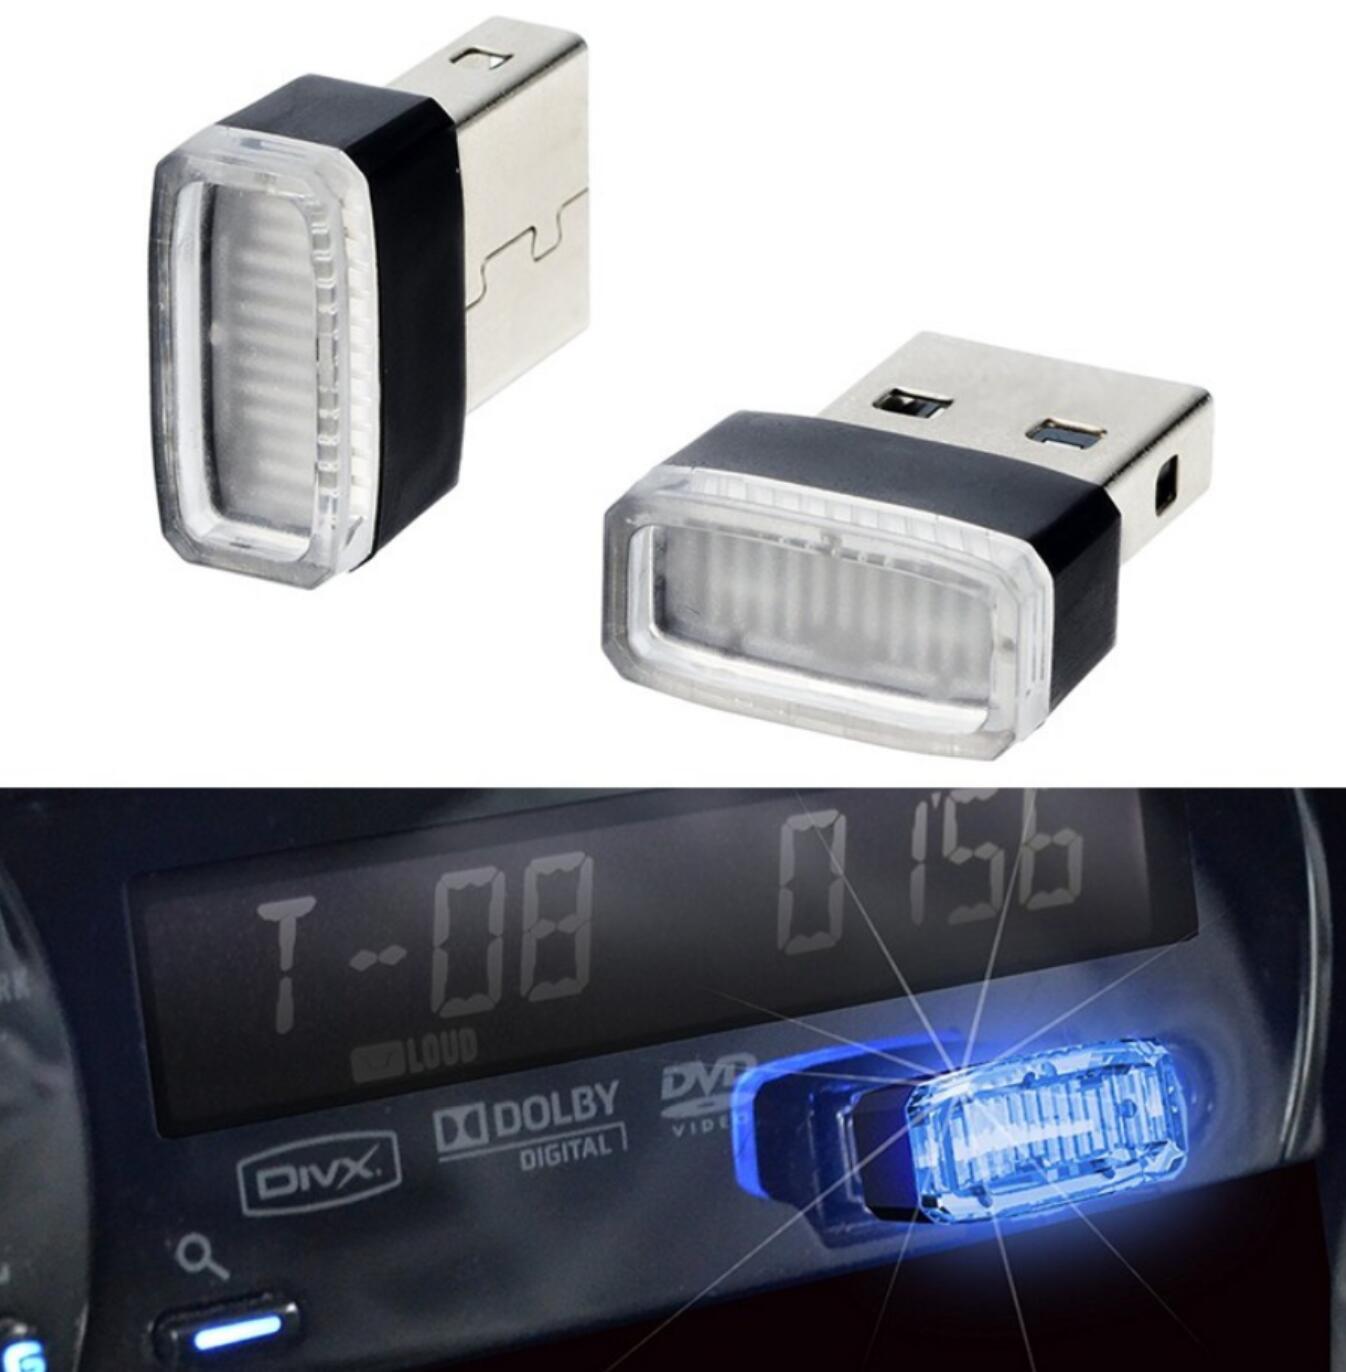 Автомобильный стиль USB атмосферная Светодиодная лампа для Mini Cooper R52 R53 R55 R56 R58 R59 R60 R61 Paceman Countryman Clubman coupe